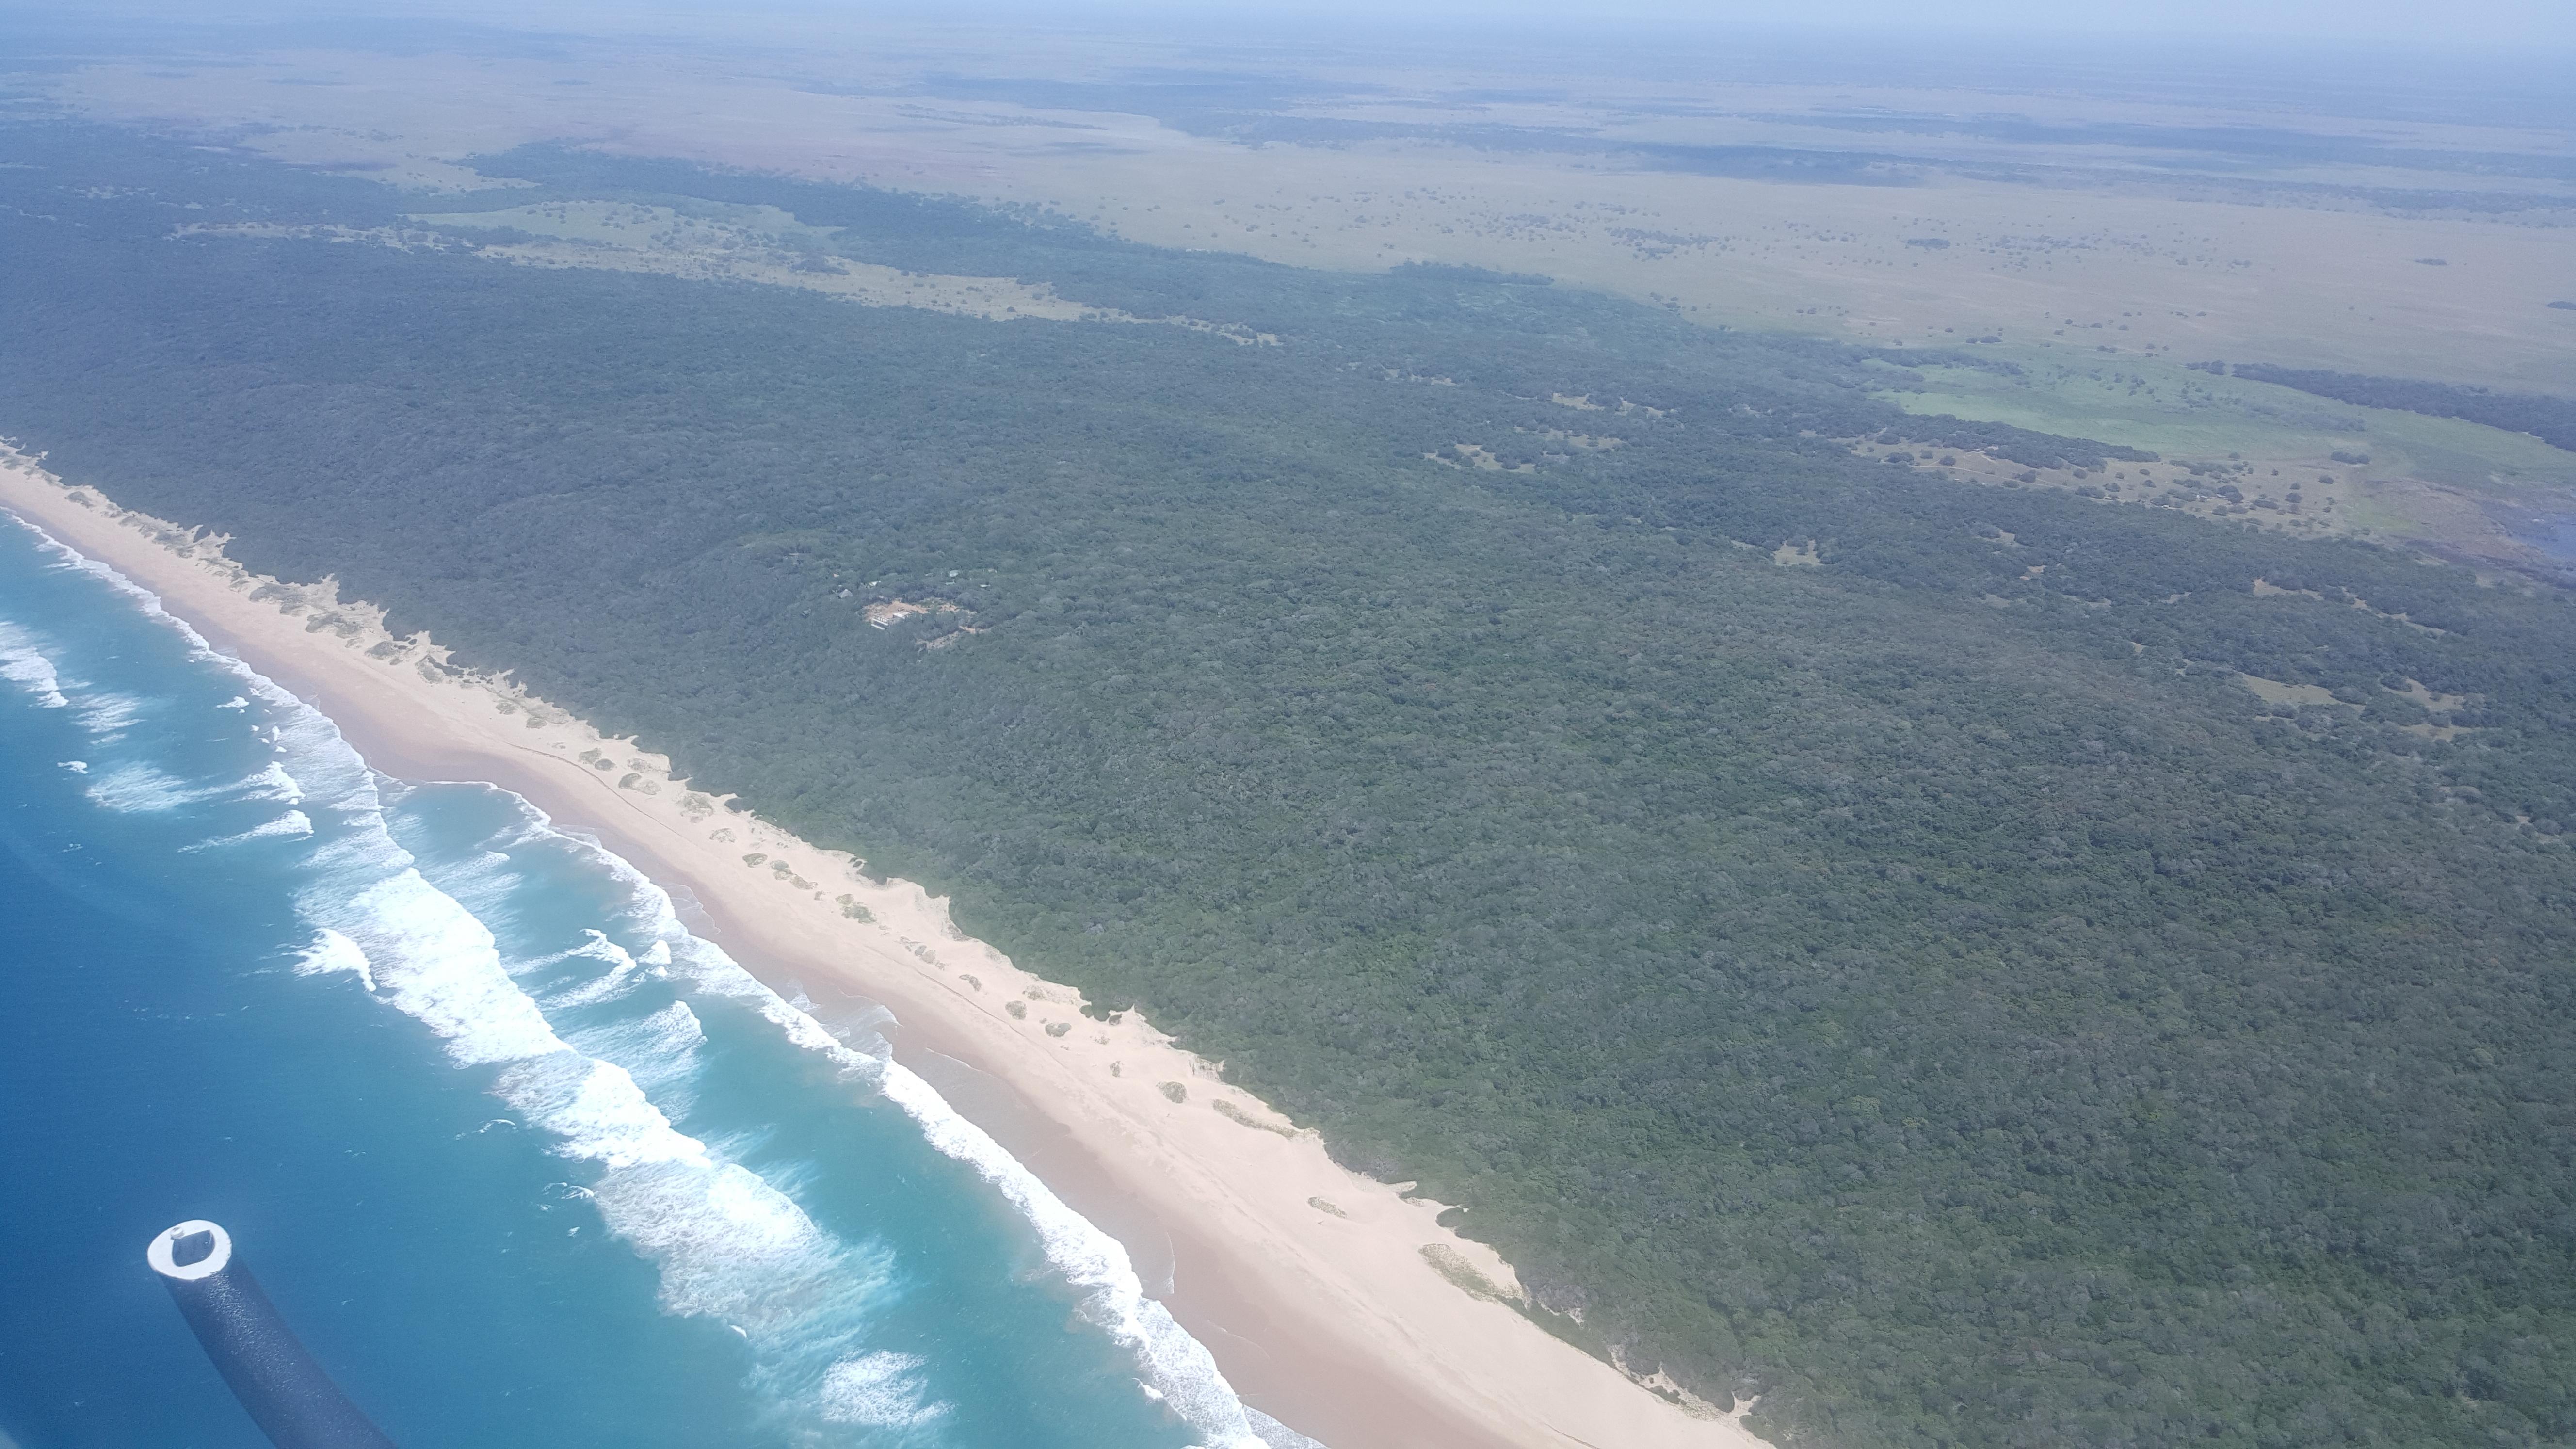 Moçambique: quilômetros e quilômetros de praias virgens